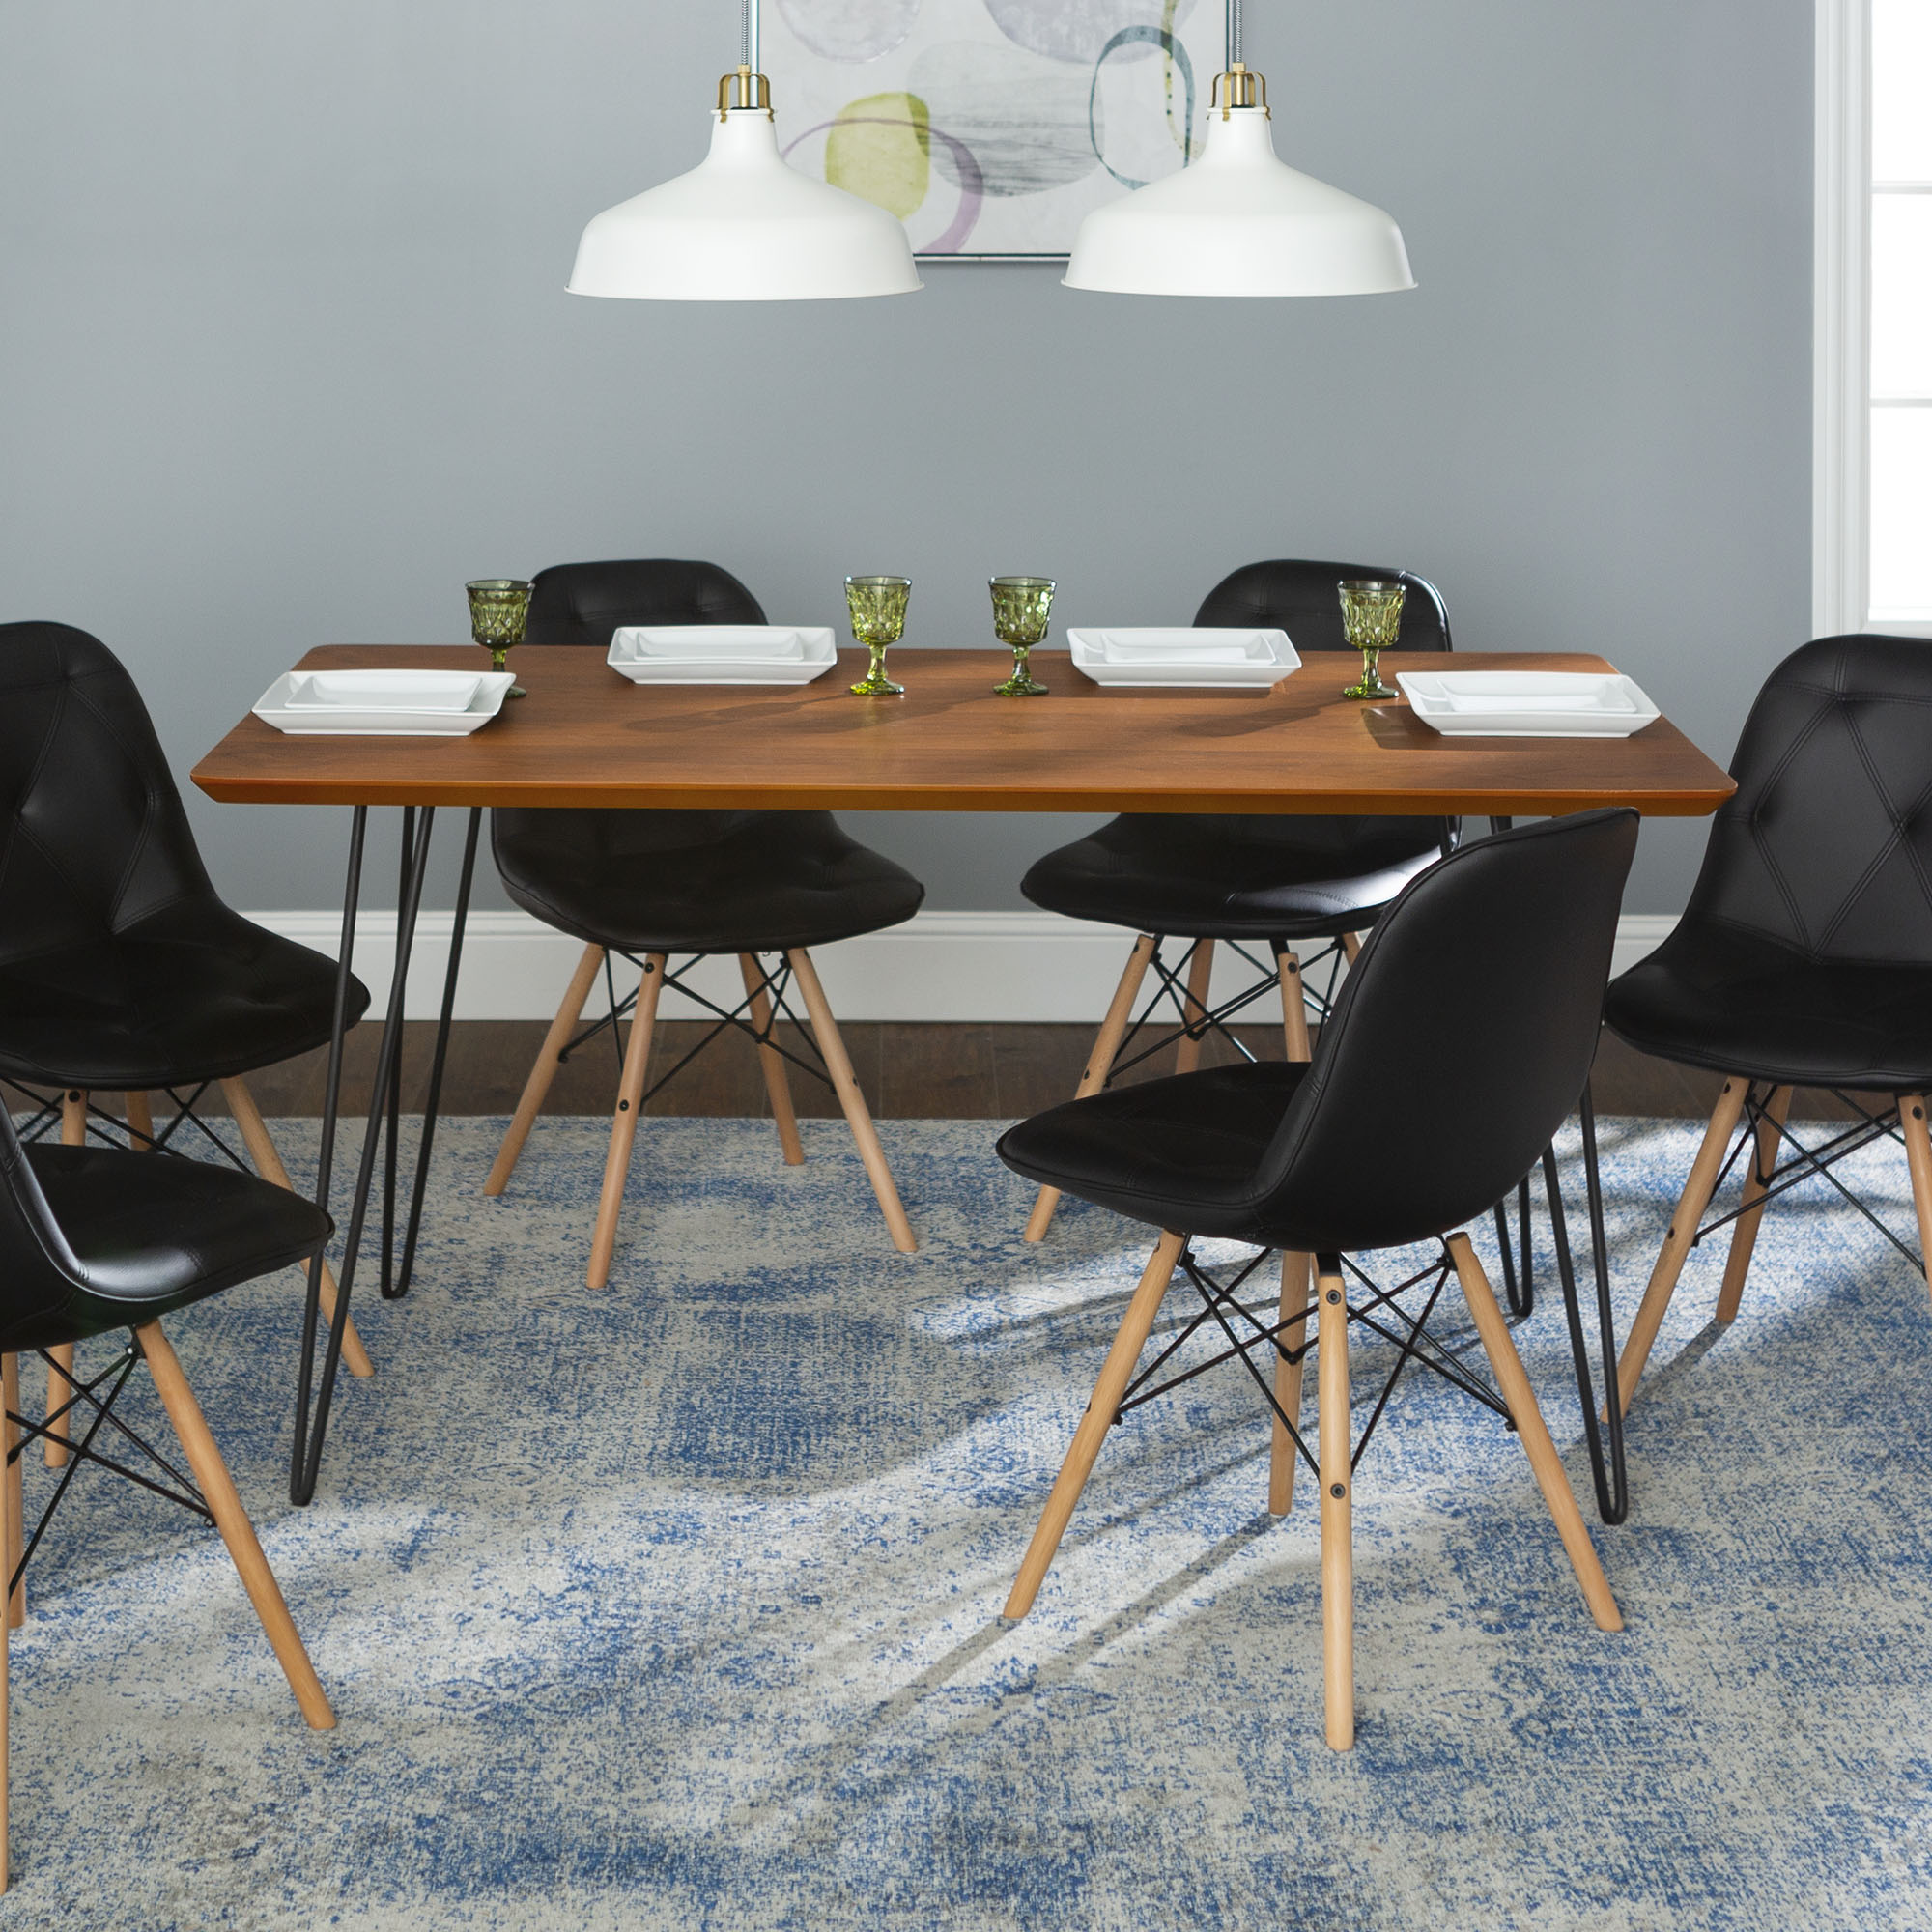 Manor Park Mid-Century Modern 7-Piece Hairpin Dining Set - Walnut / Black